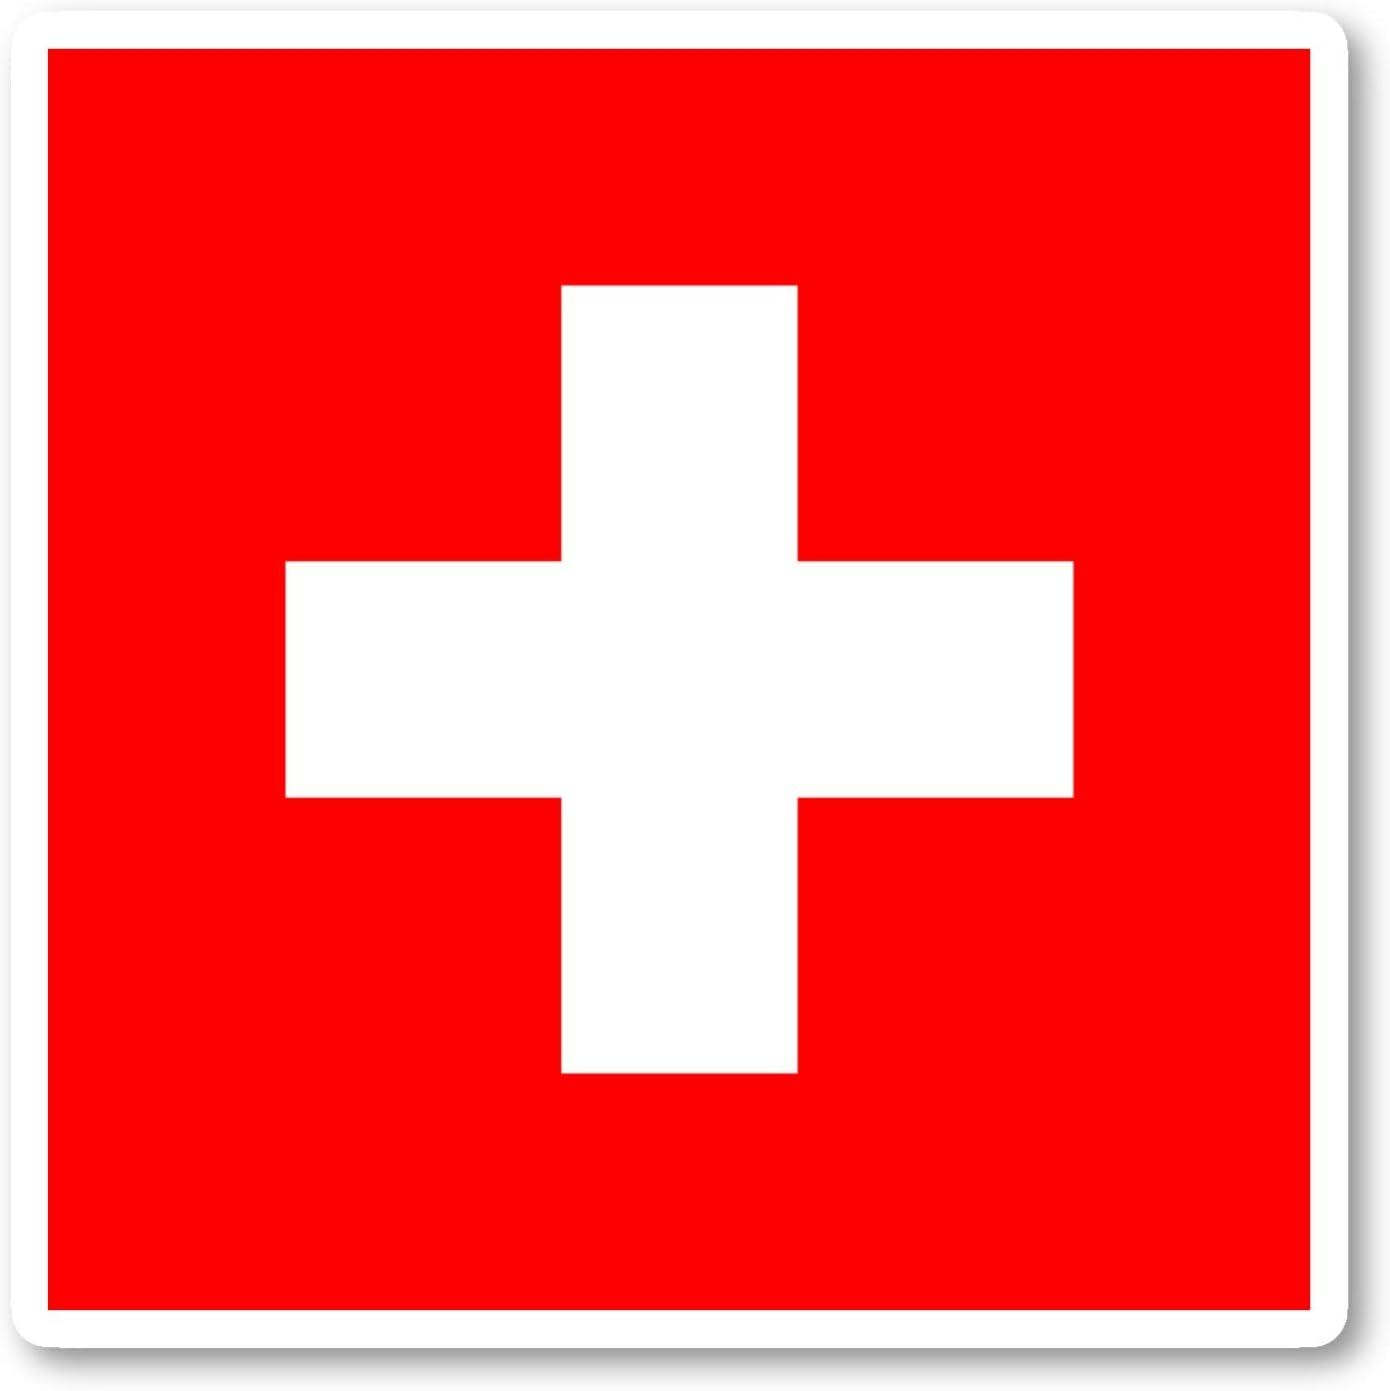 Switzerland Swiss Flag Sticker Flag Stickers - Laptop Stickers - Vinyl Decal - Laptop, Phone, Tablet Vinyl Decal Sticker S214736 (4 Inches)